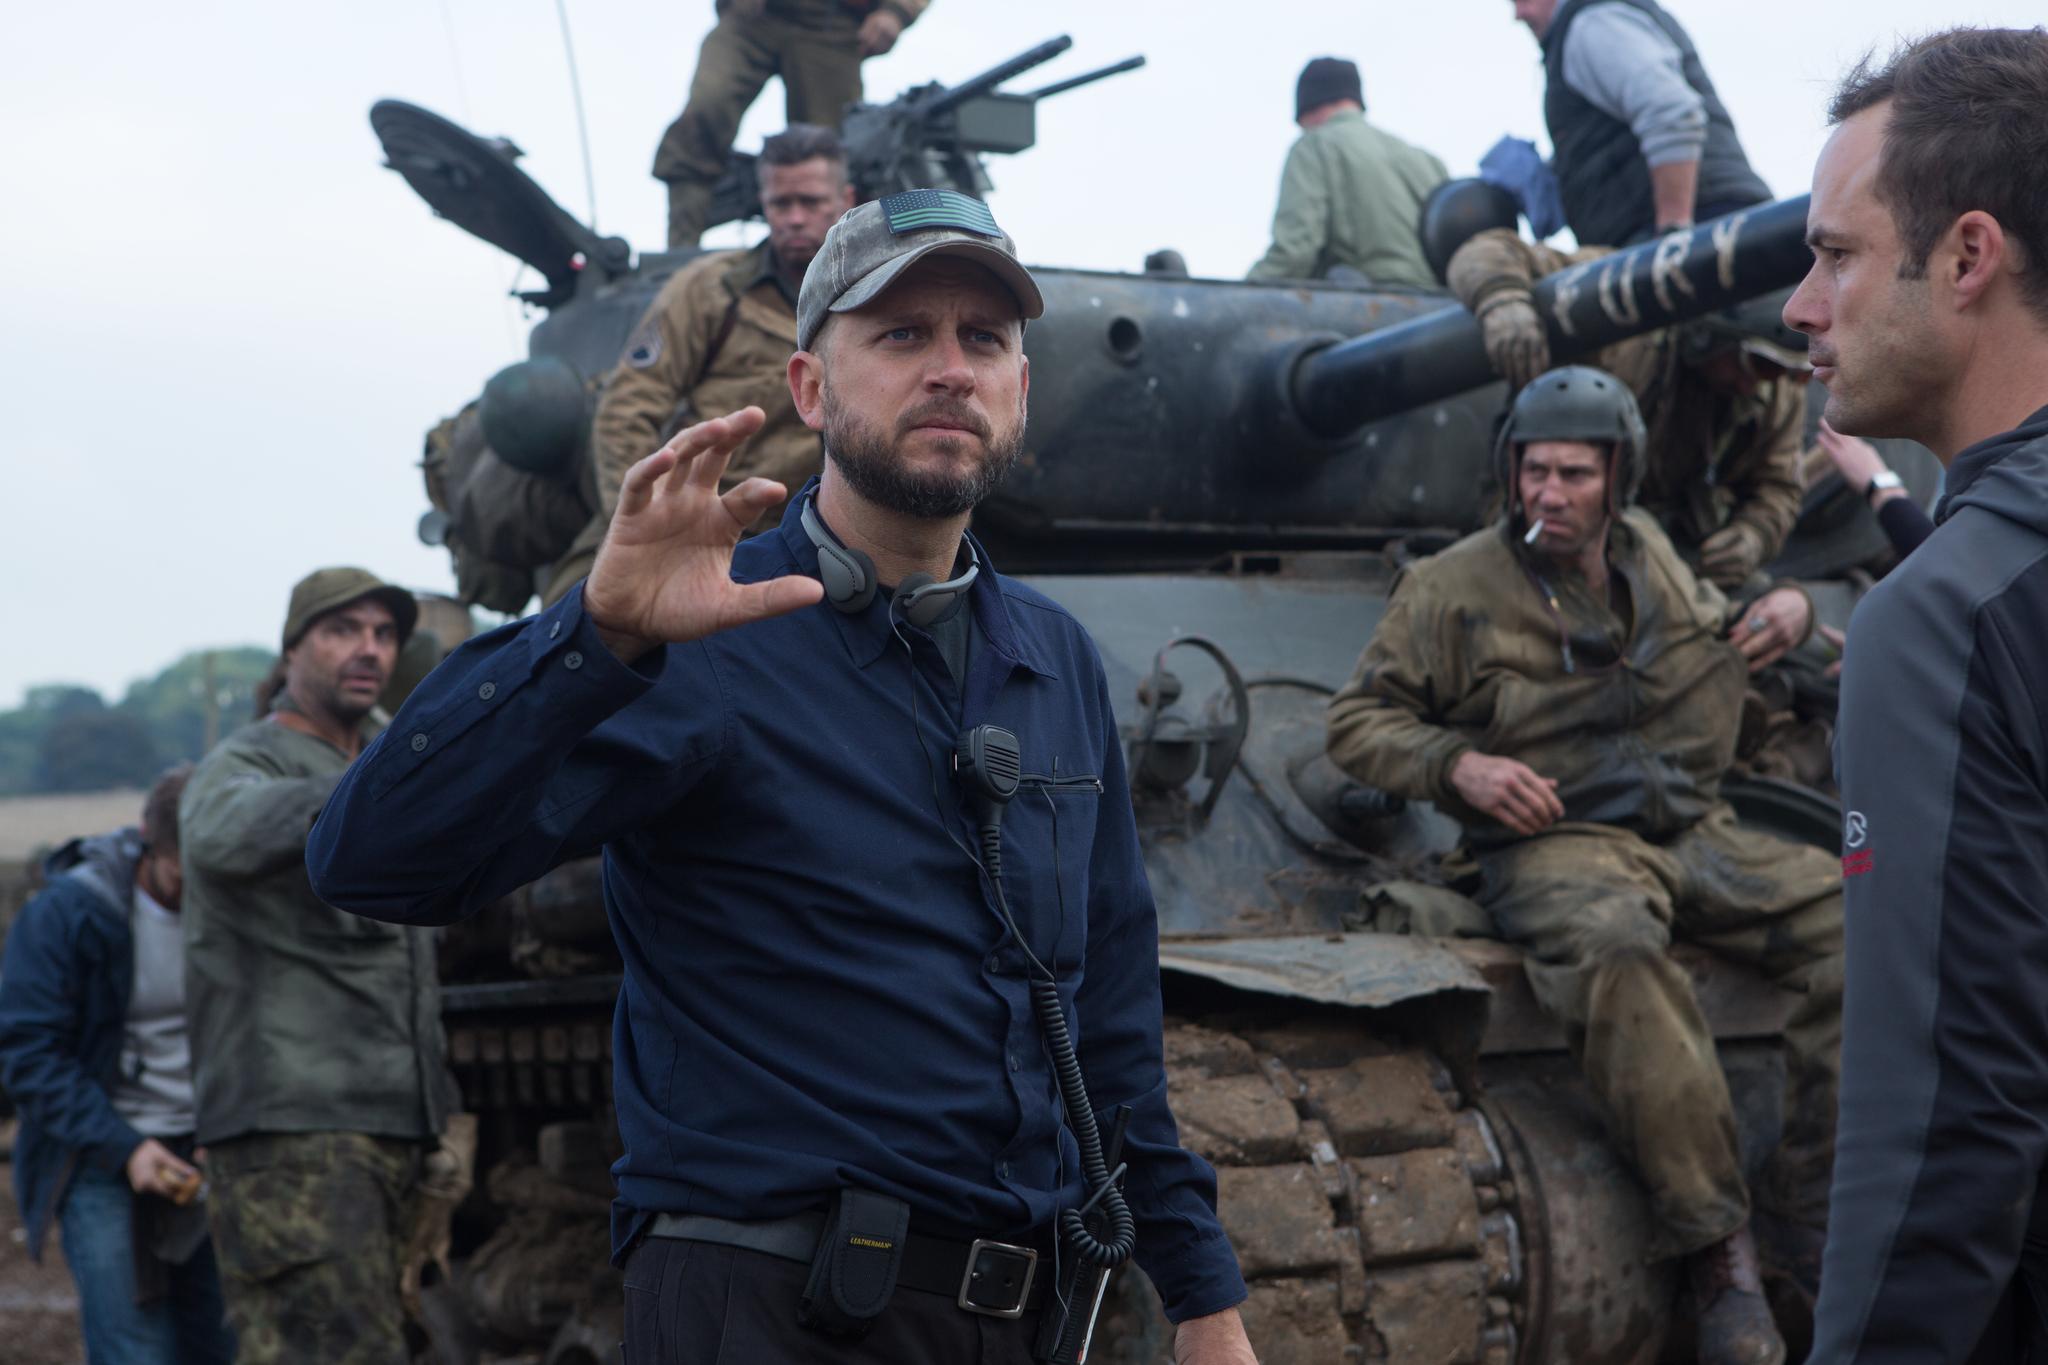 Brad Pitt, David Ayer, Toby Hefferman, Jon Bernthal, and Kevin Vance in Fury (2014)